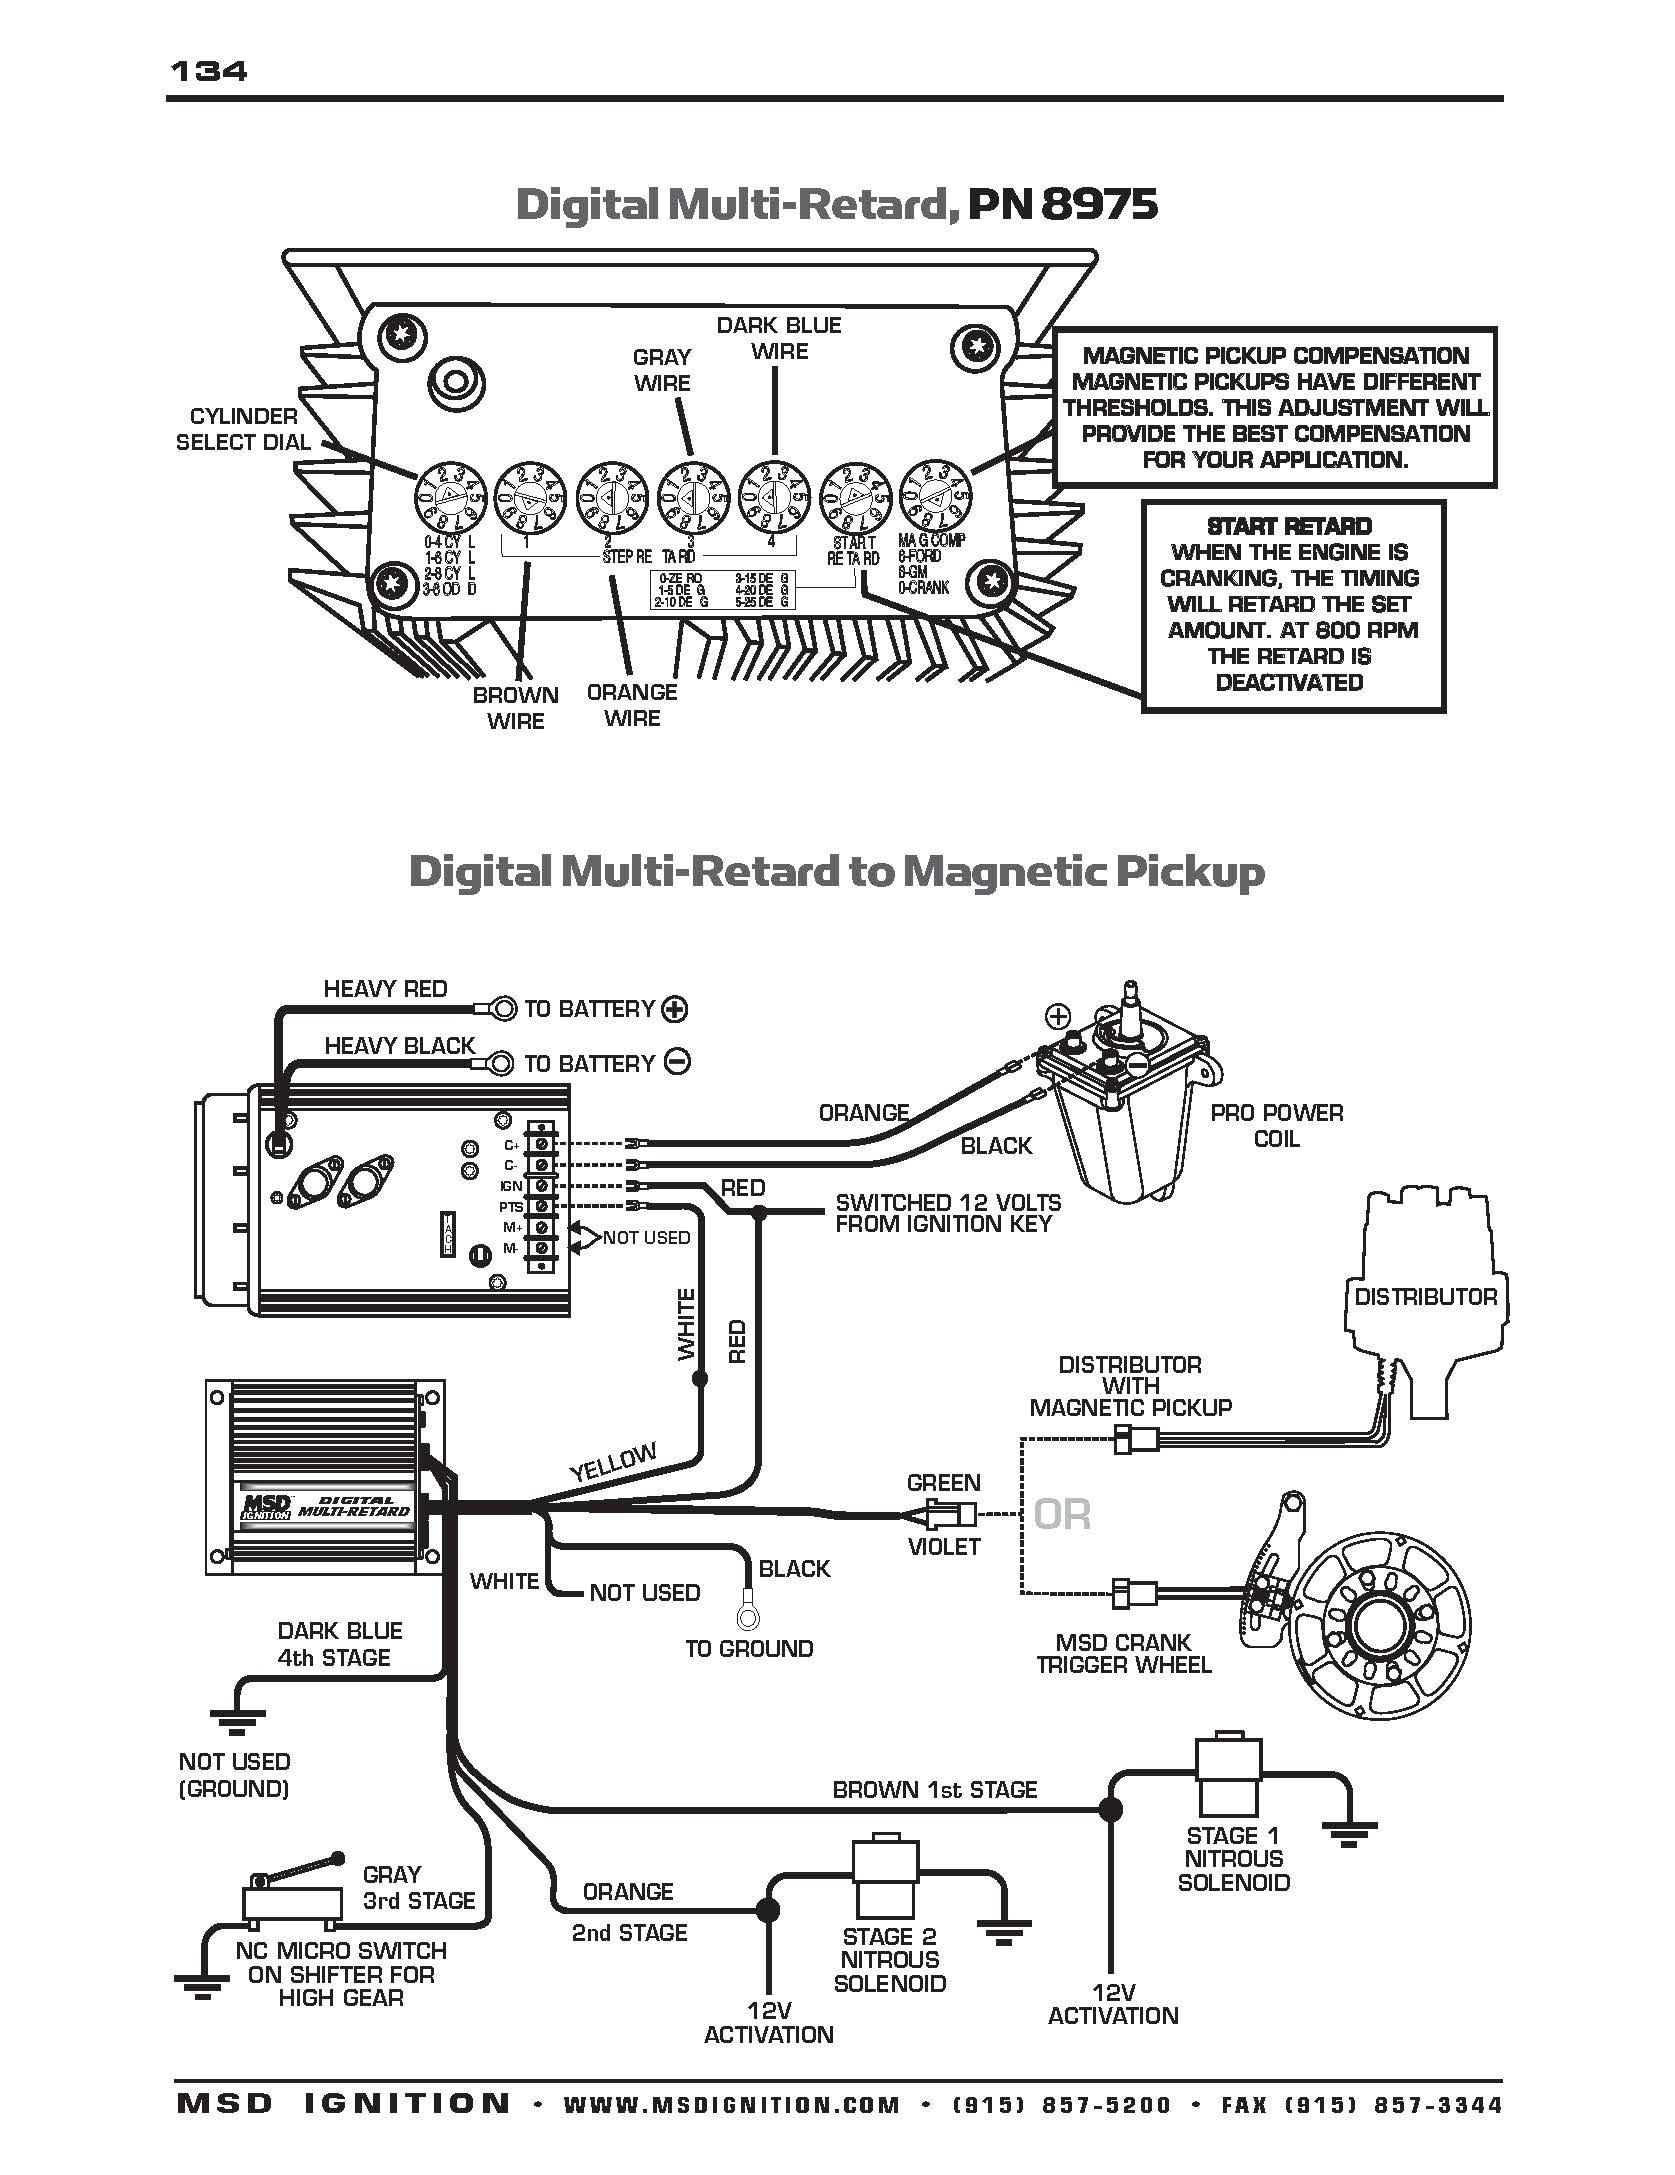 msd 6btm wiring diagram Download-Msd Distributor Wiring Diagram WIRING DIAGRAM 8-n